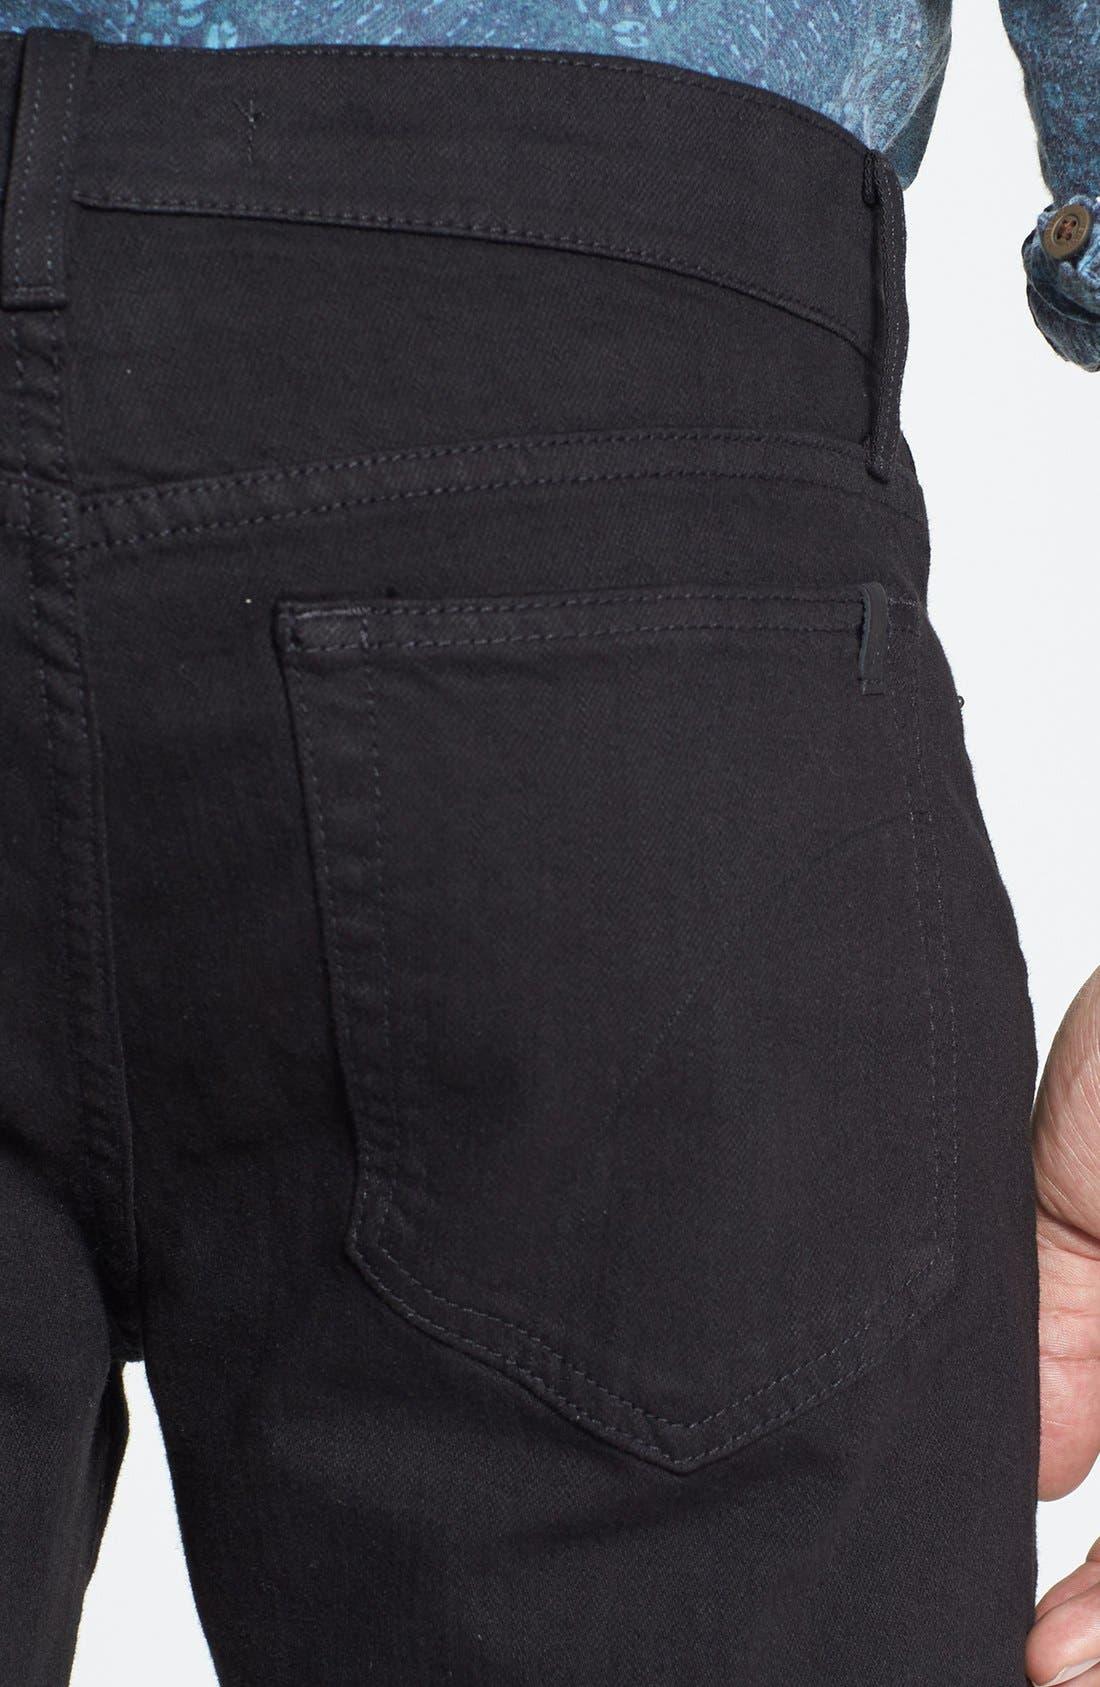 Alternate Image 4  - Joe's 'Brixton' Slim Fit Jeans (Jet Black)